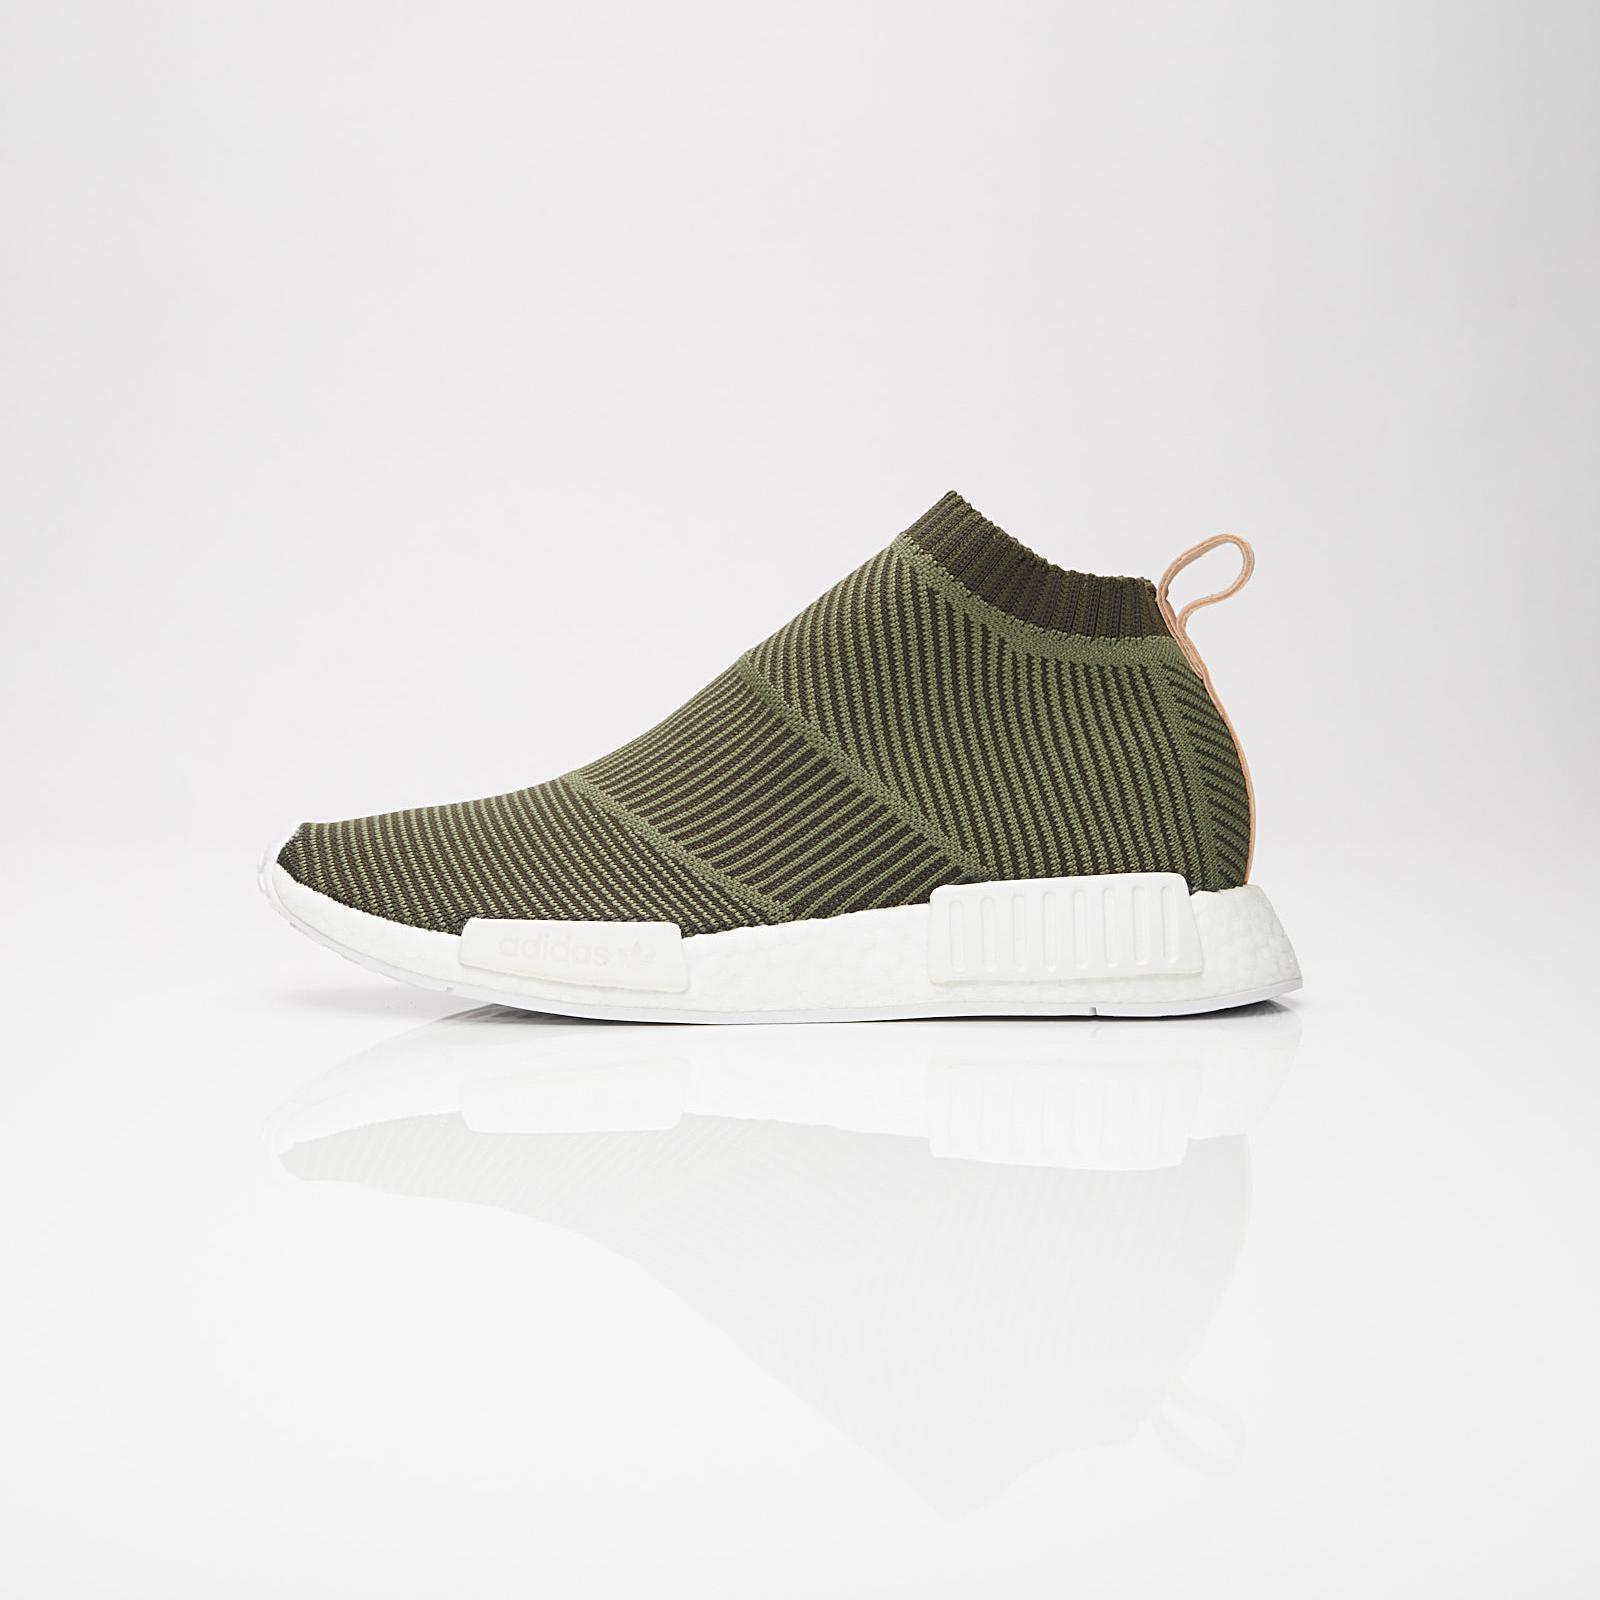 196b59867b adidas NMD CS1 PK - B37638 - Sneakersnstuff | sneakers & streetwear ...